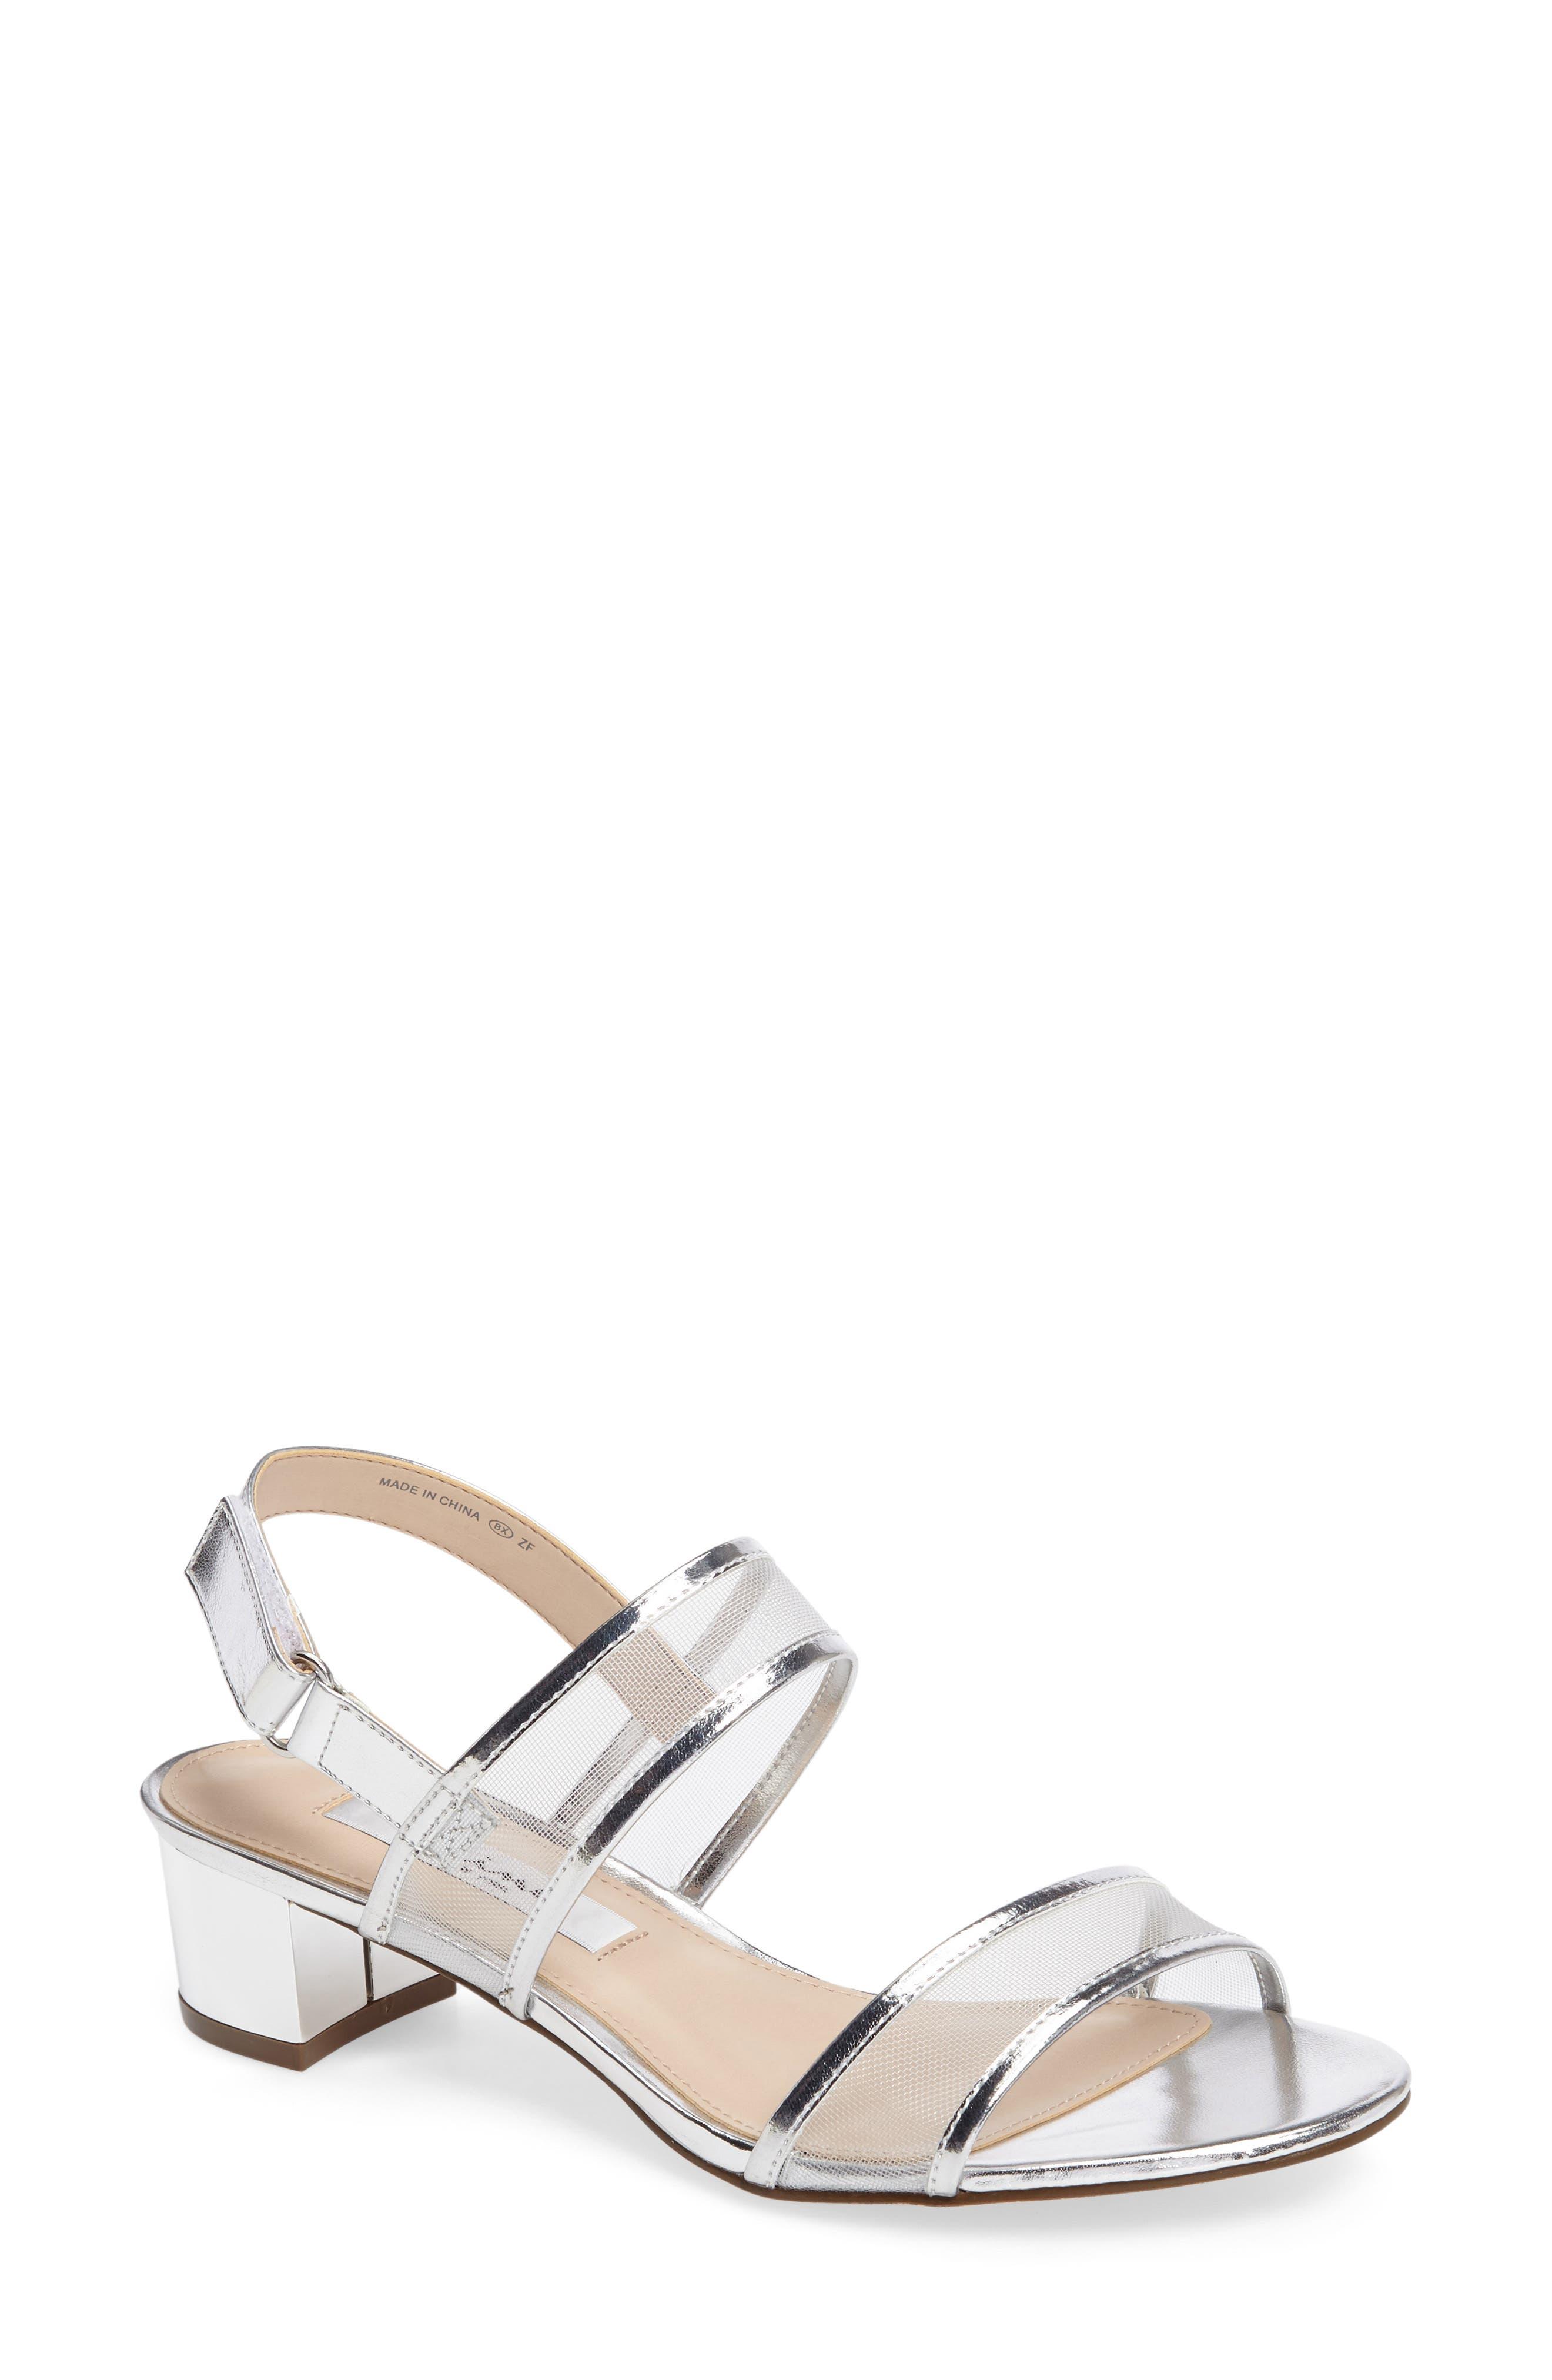 Ganice Mesh Strap Sandal,                         Main,                         color, Silver Faux Leather